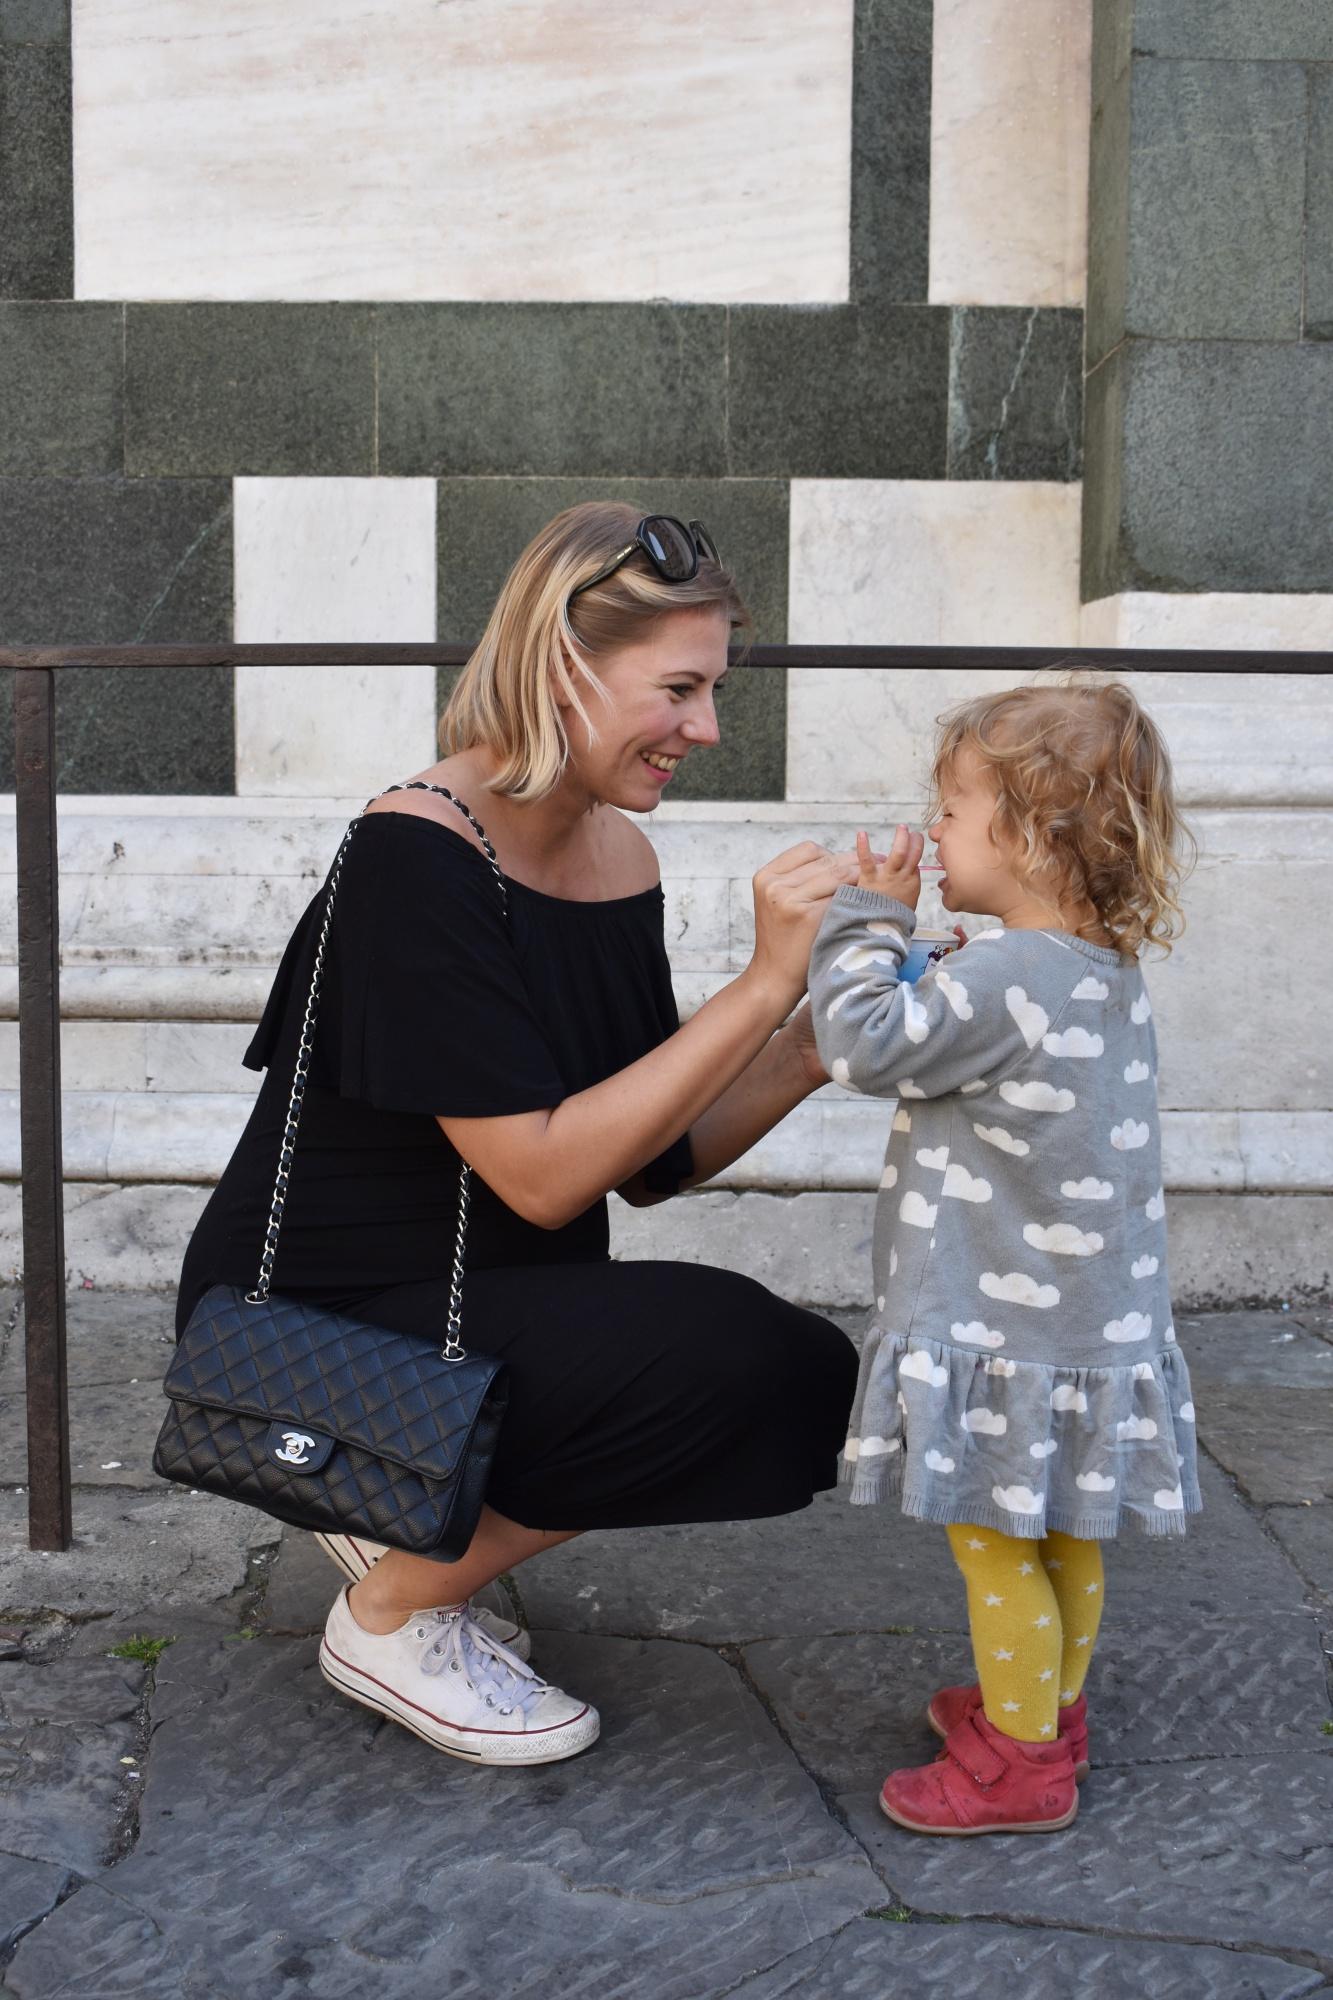 Reiseziele mit Kind